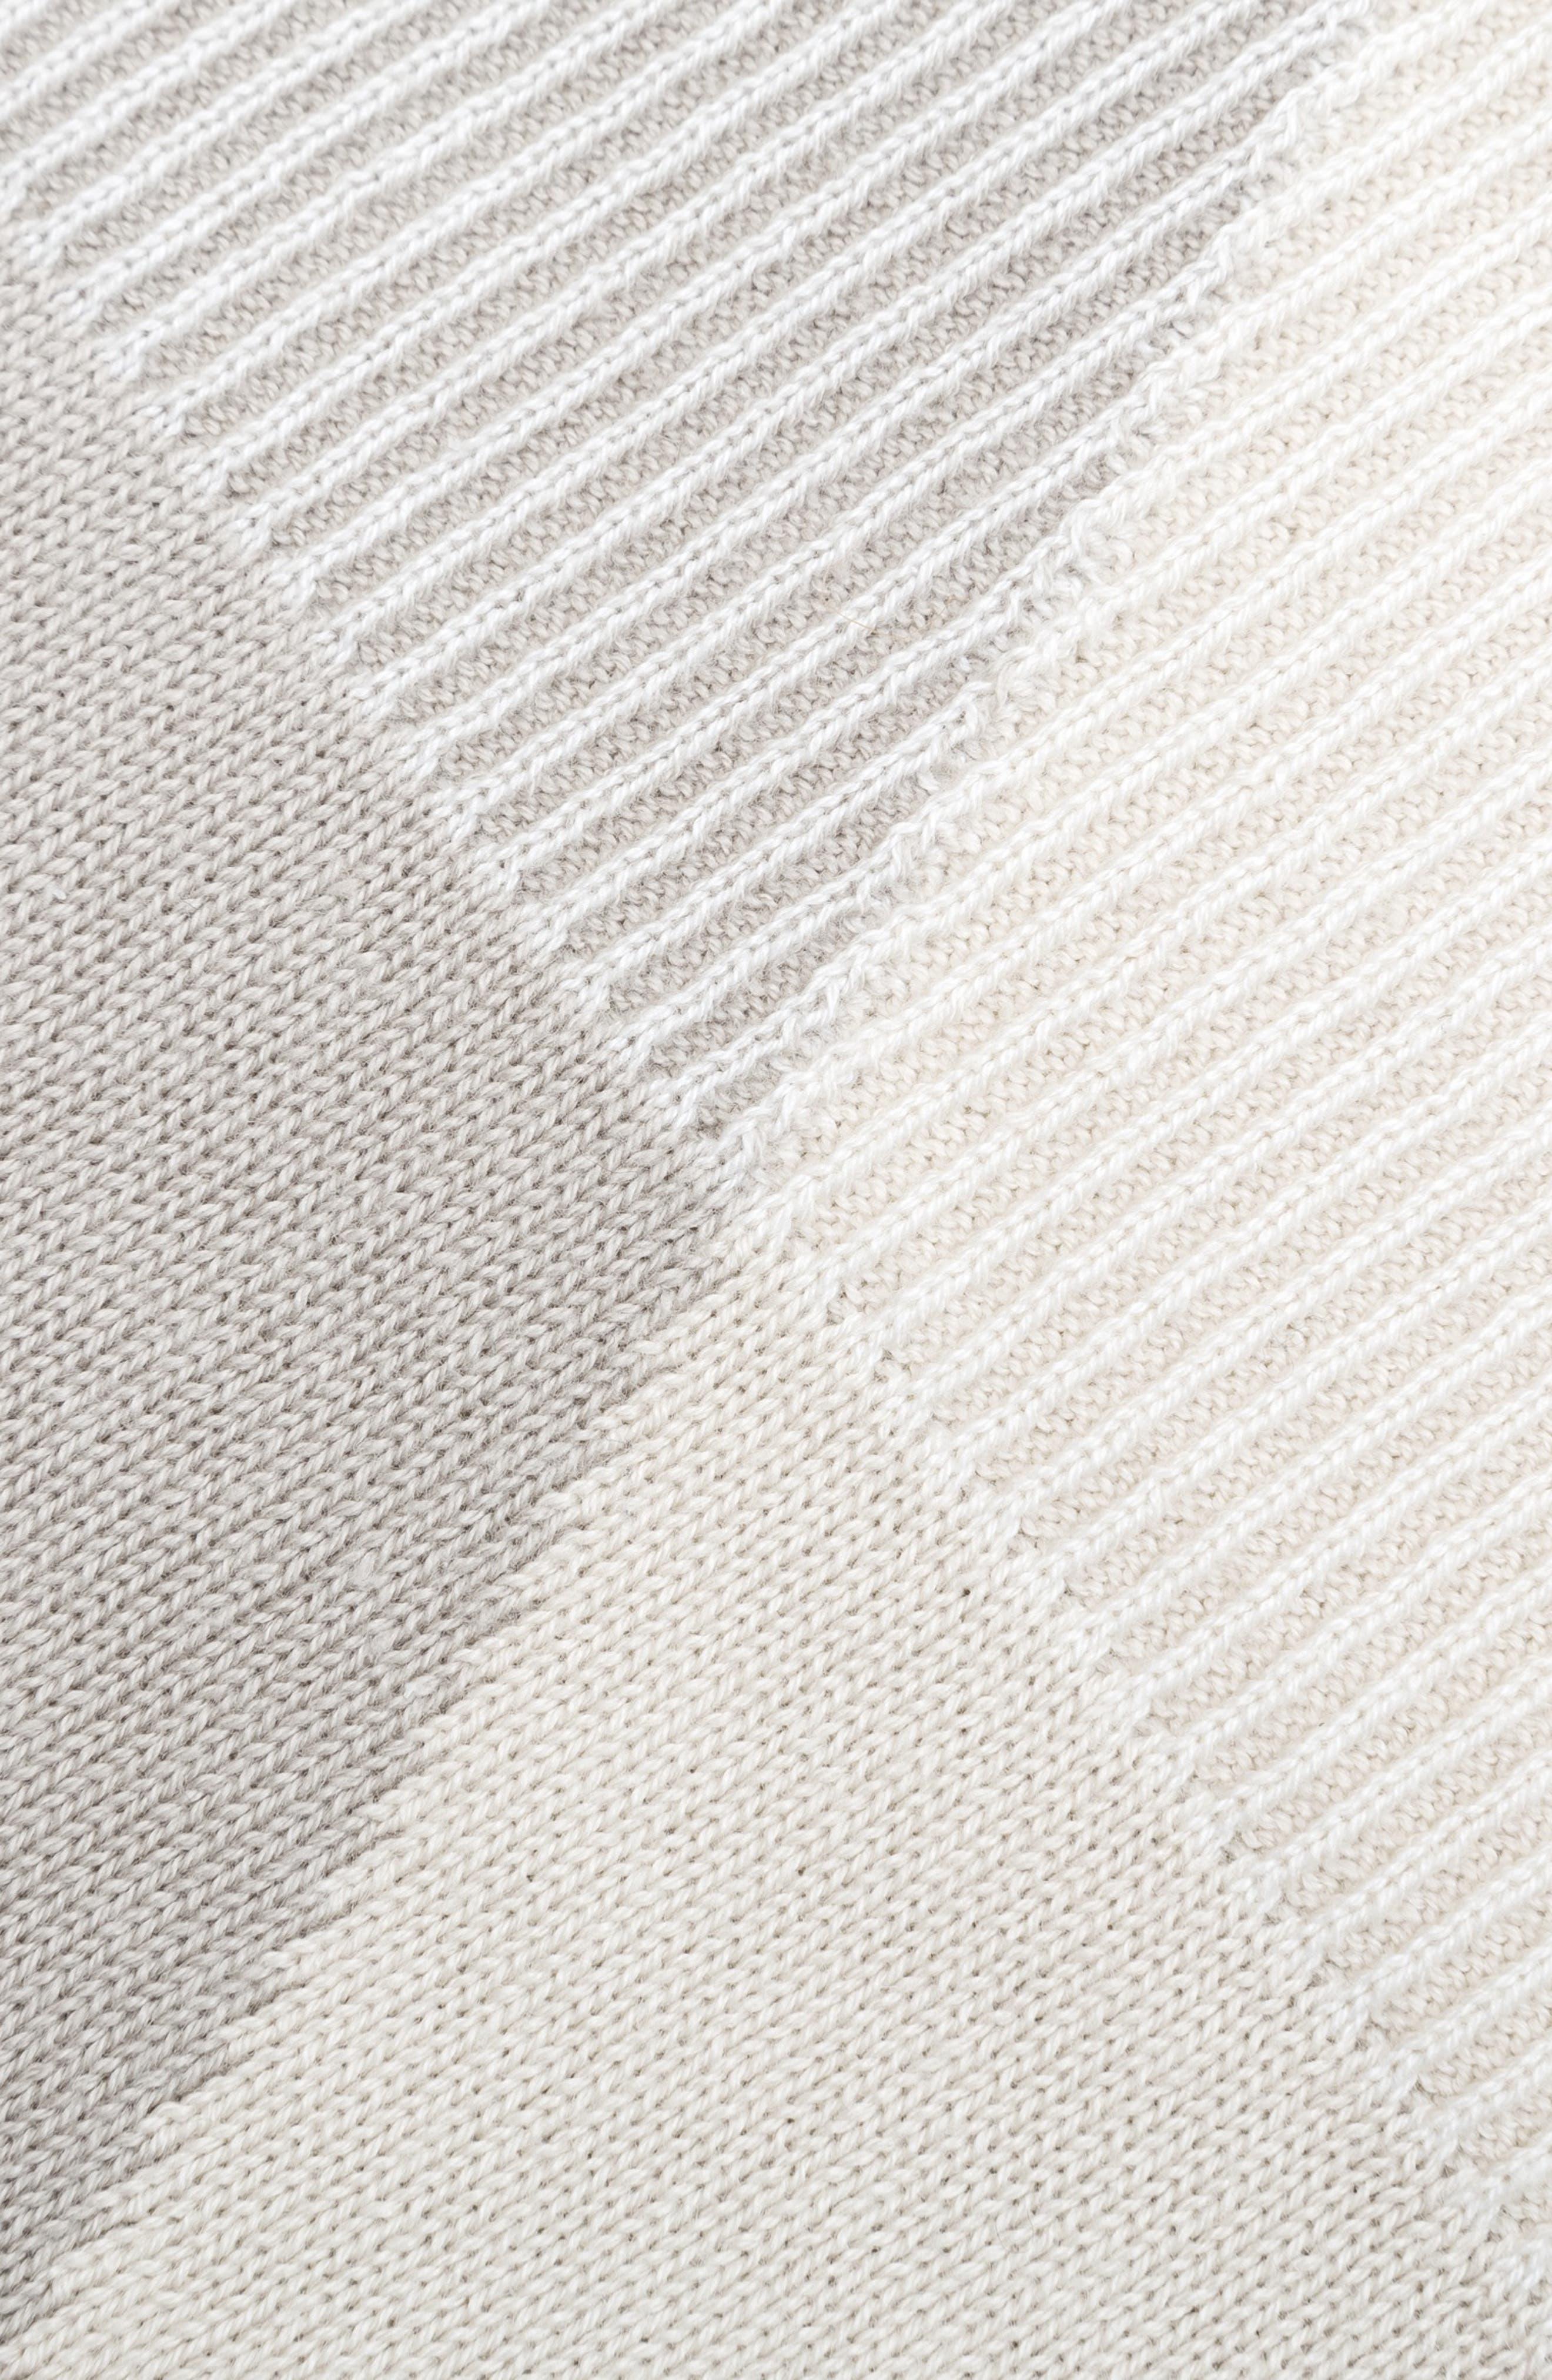 STOKKE, Organic Cotton Knit Blanket, Alternate thumbnail 2, color, BEIGE